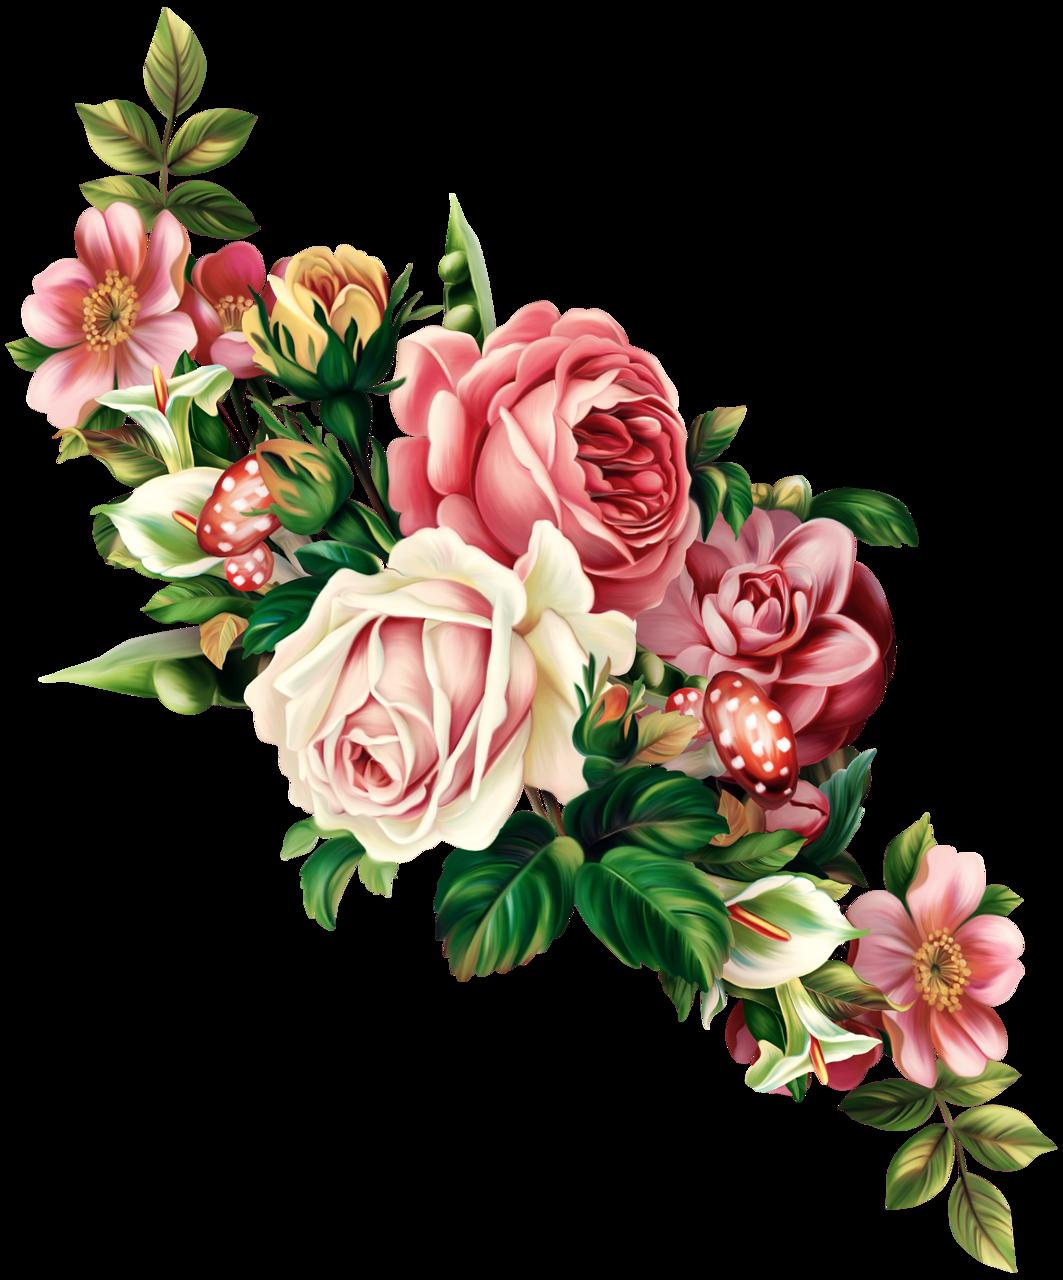 flower clip art flower images mycutegraphics - 736×886